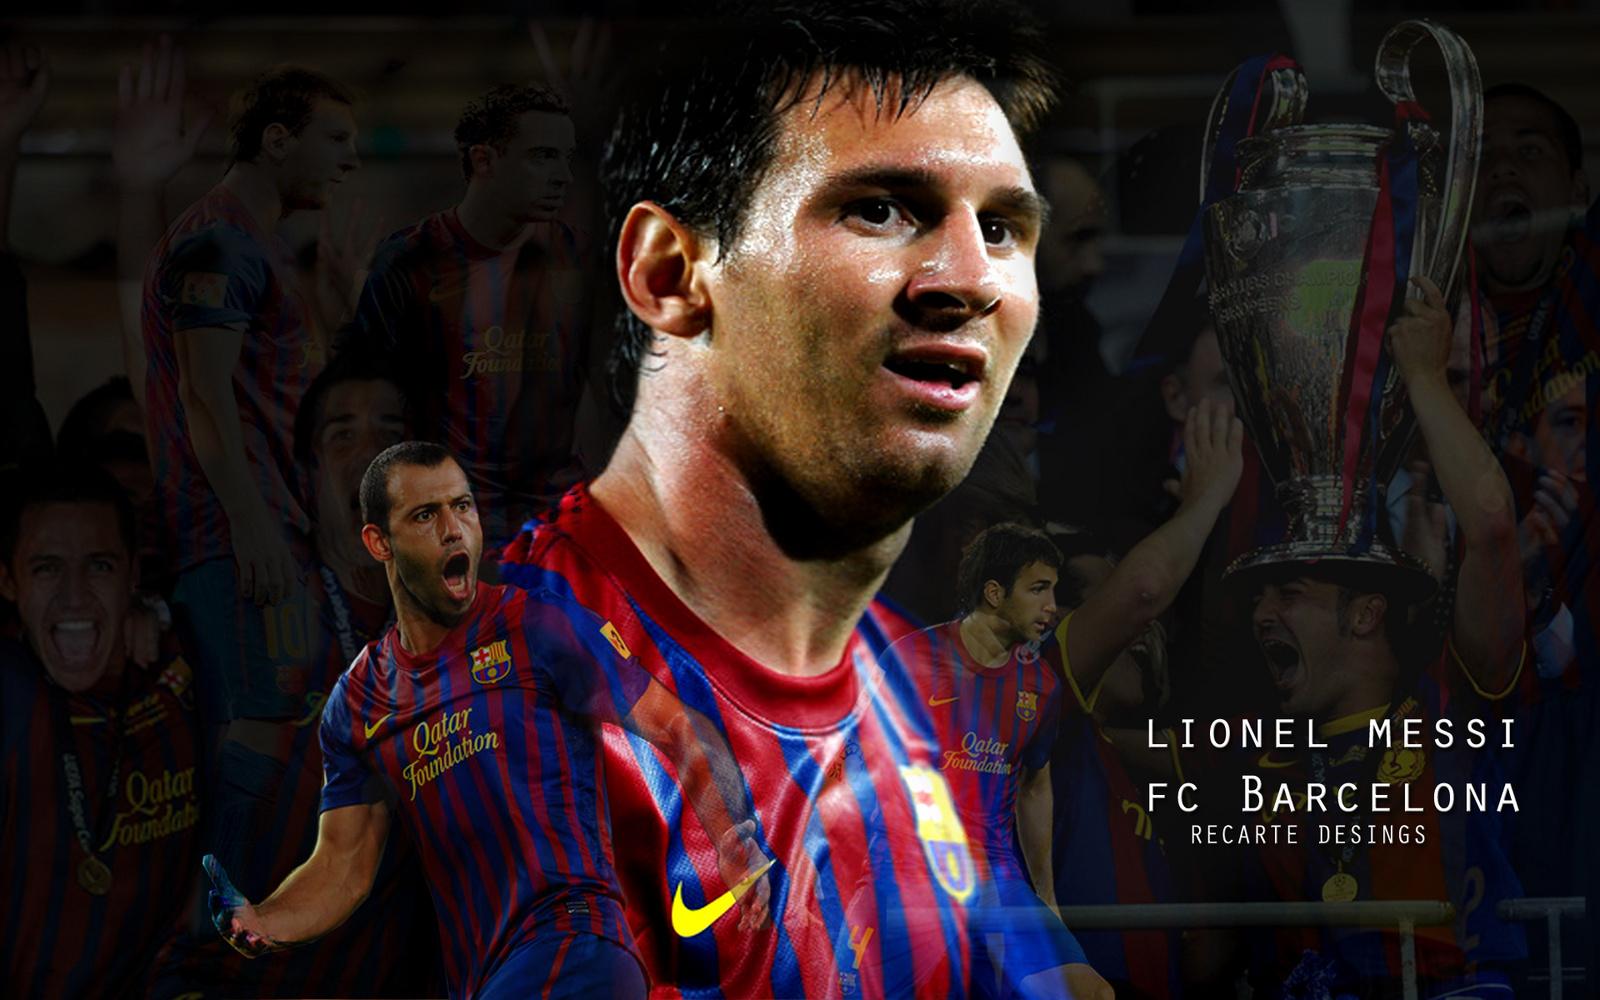 http://4.bp.blogspot.com/-UYDyqZaB2wo/UAFjazHIpnI/AAAAAAAAWig/d4RnvPIOrBw/s1600/Argentina+Football+Star+Lionel+Messi+HD+Photos+2012.jpg